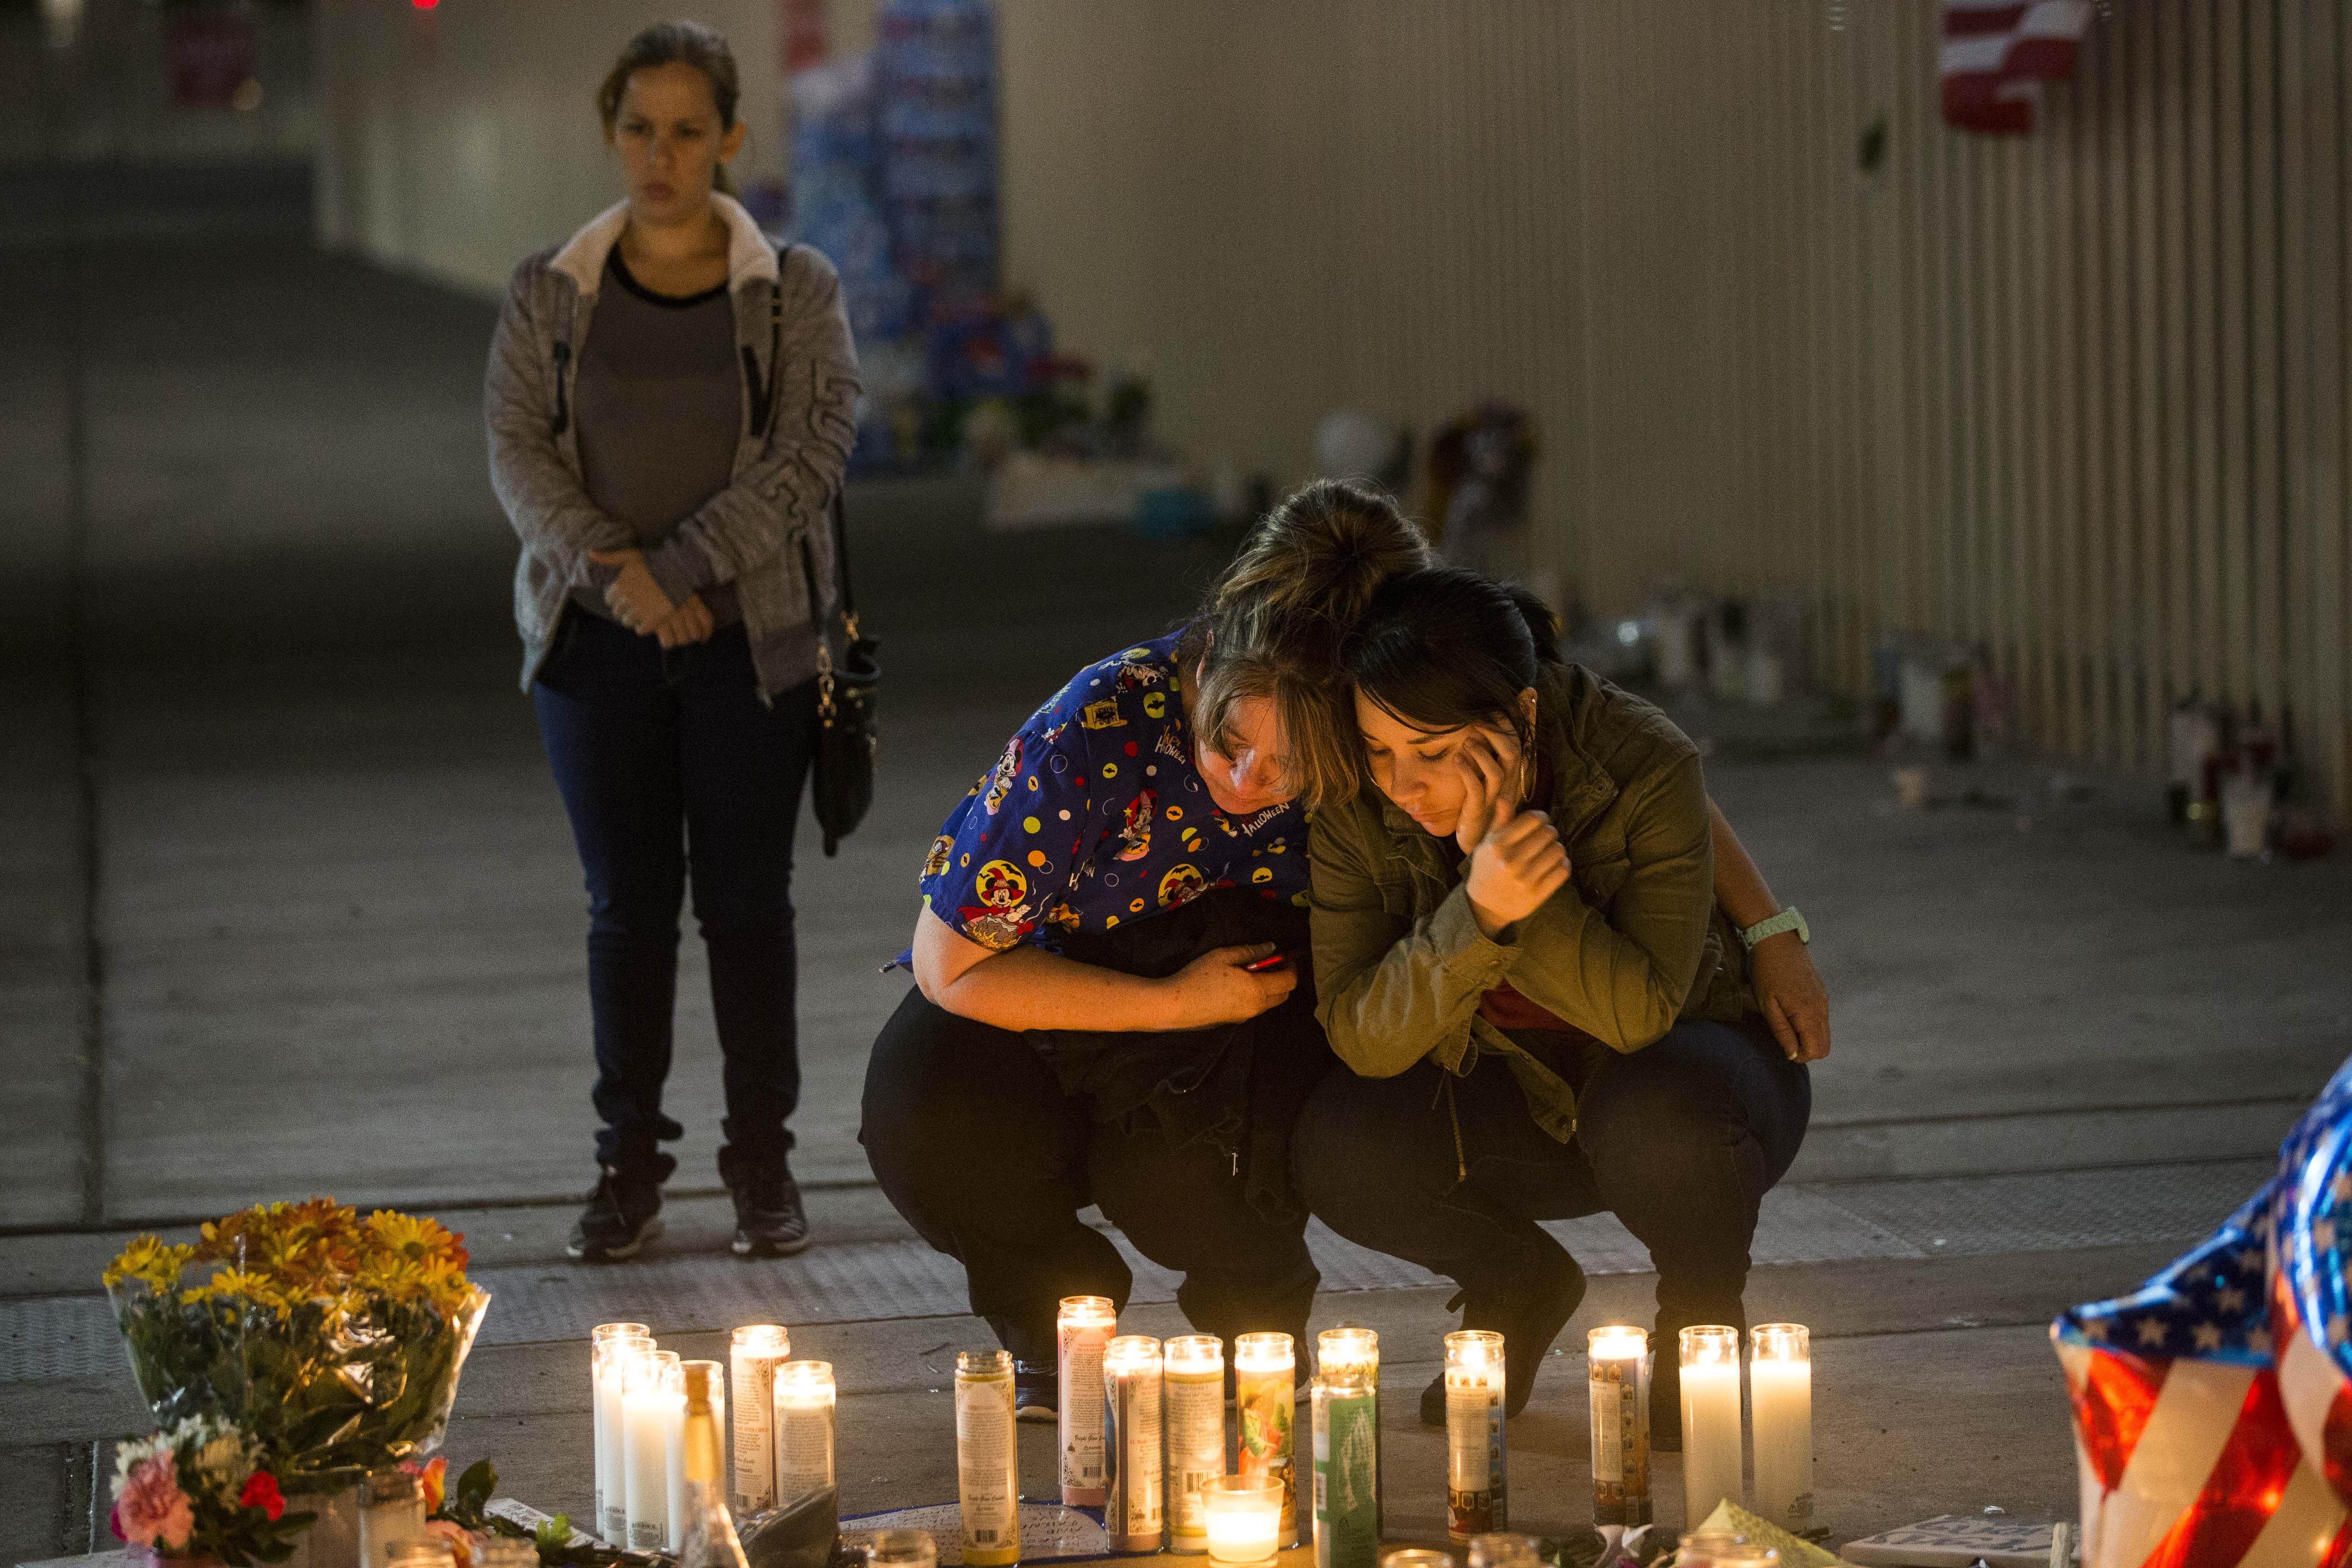 Vegas shooting reminds Detroit Lions WR Tate of 'terrible memories'